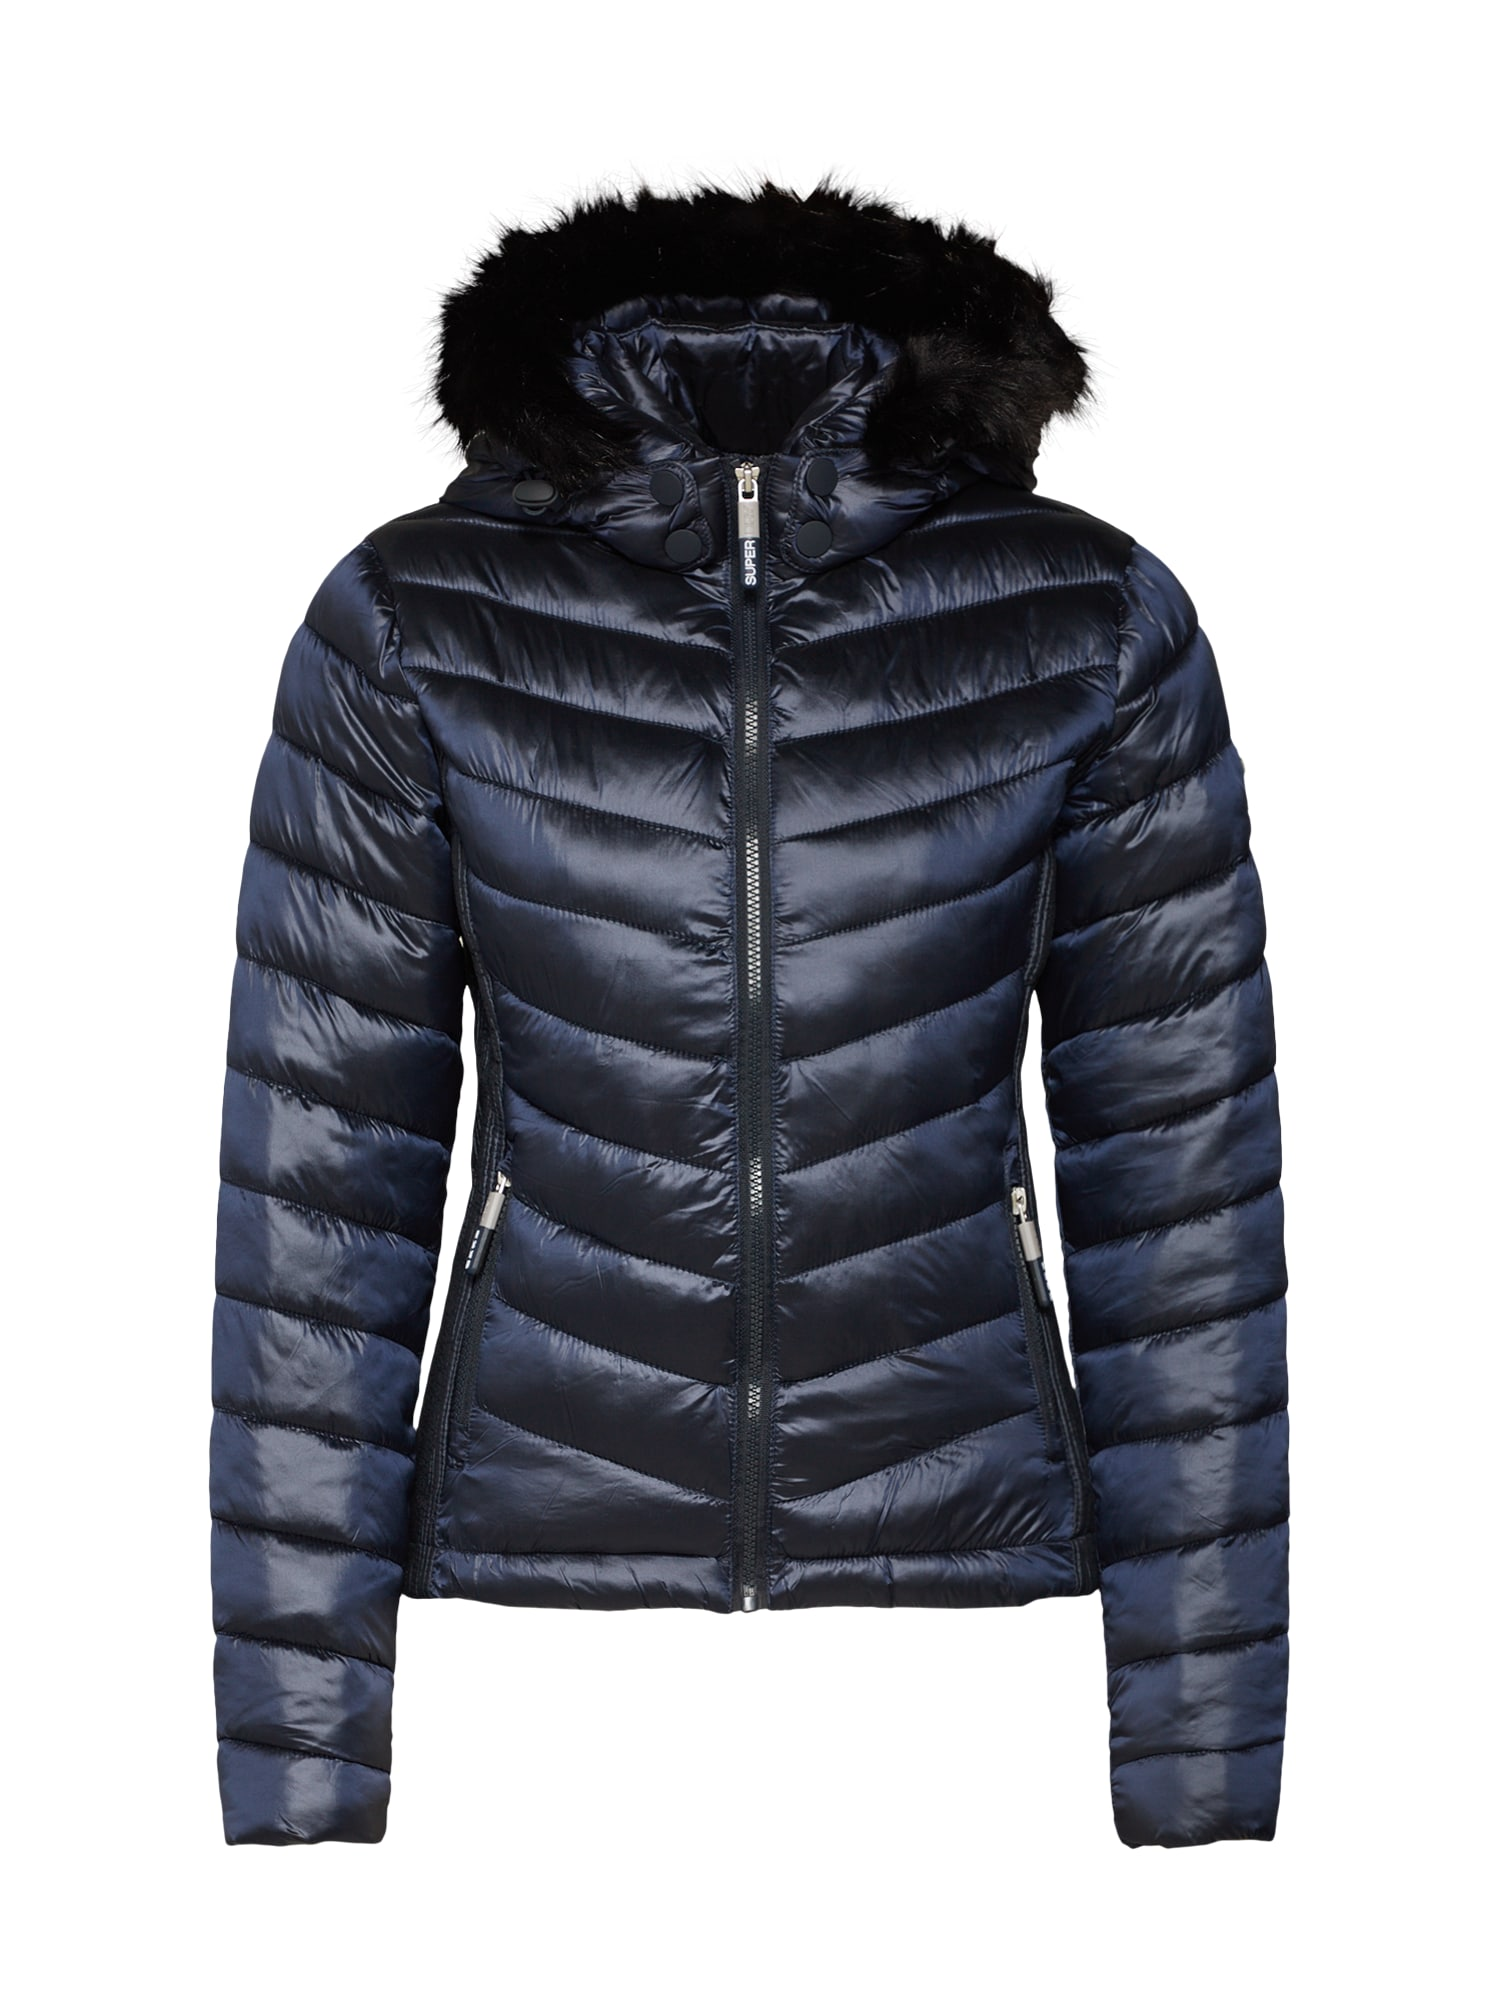 a80292068e6 Superdry Dames Winterjas Hooded Luxe Chevron Fuji Nachtblauw superdry kopen  in de aanbieding